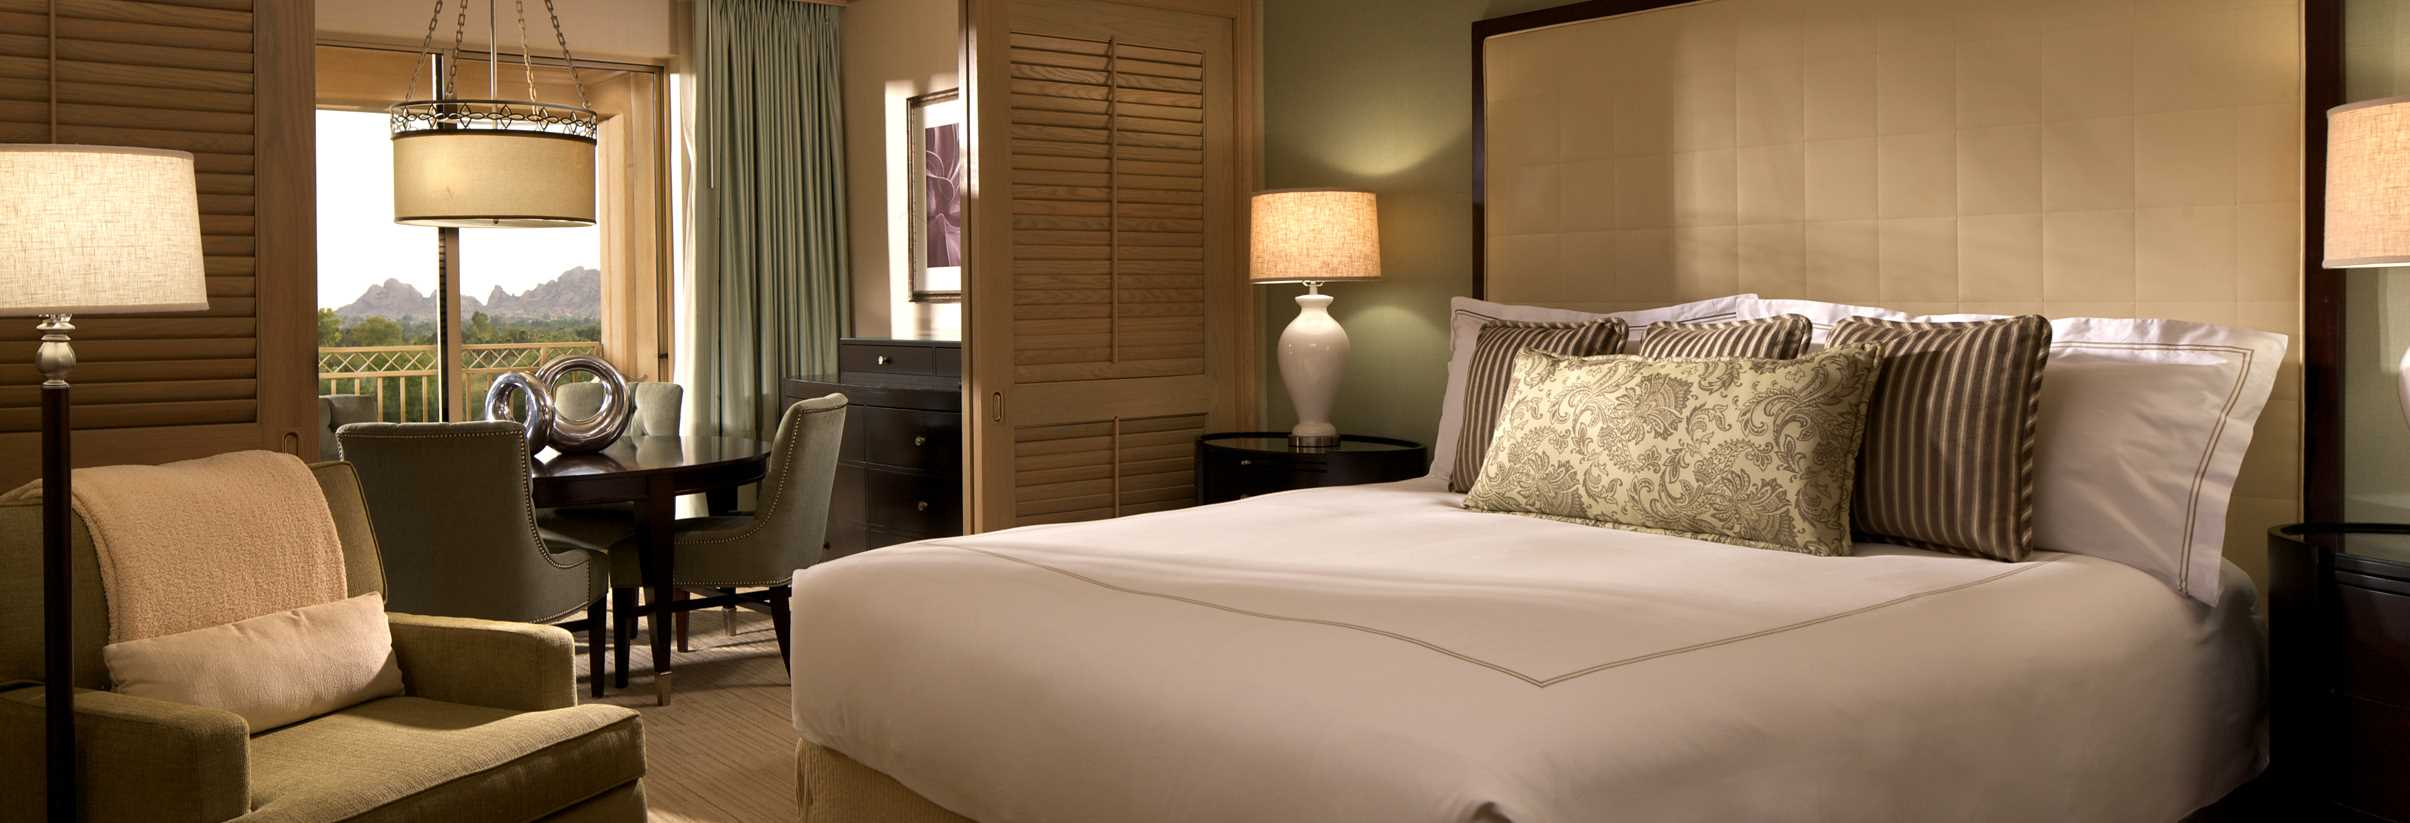 Scottsdale Arizona Inspirato Luxury Vacation Homes Inspirato